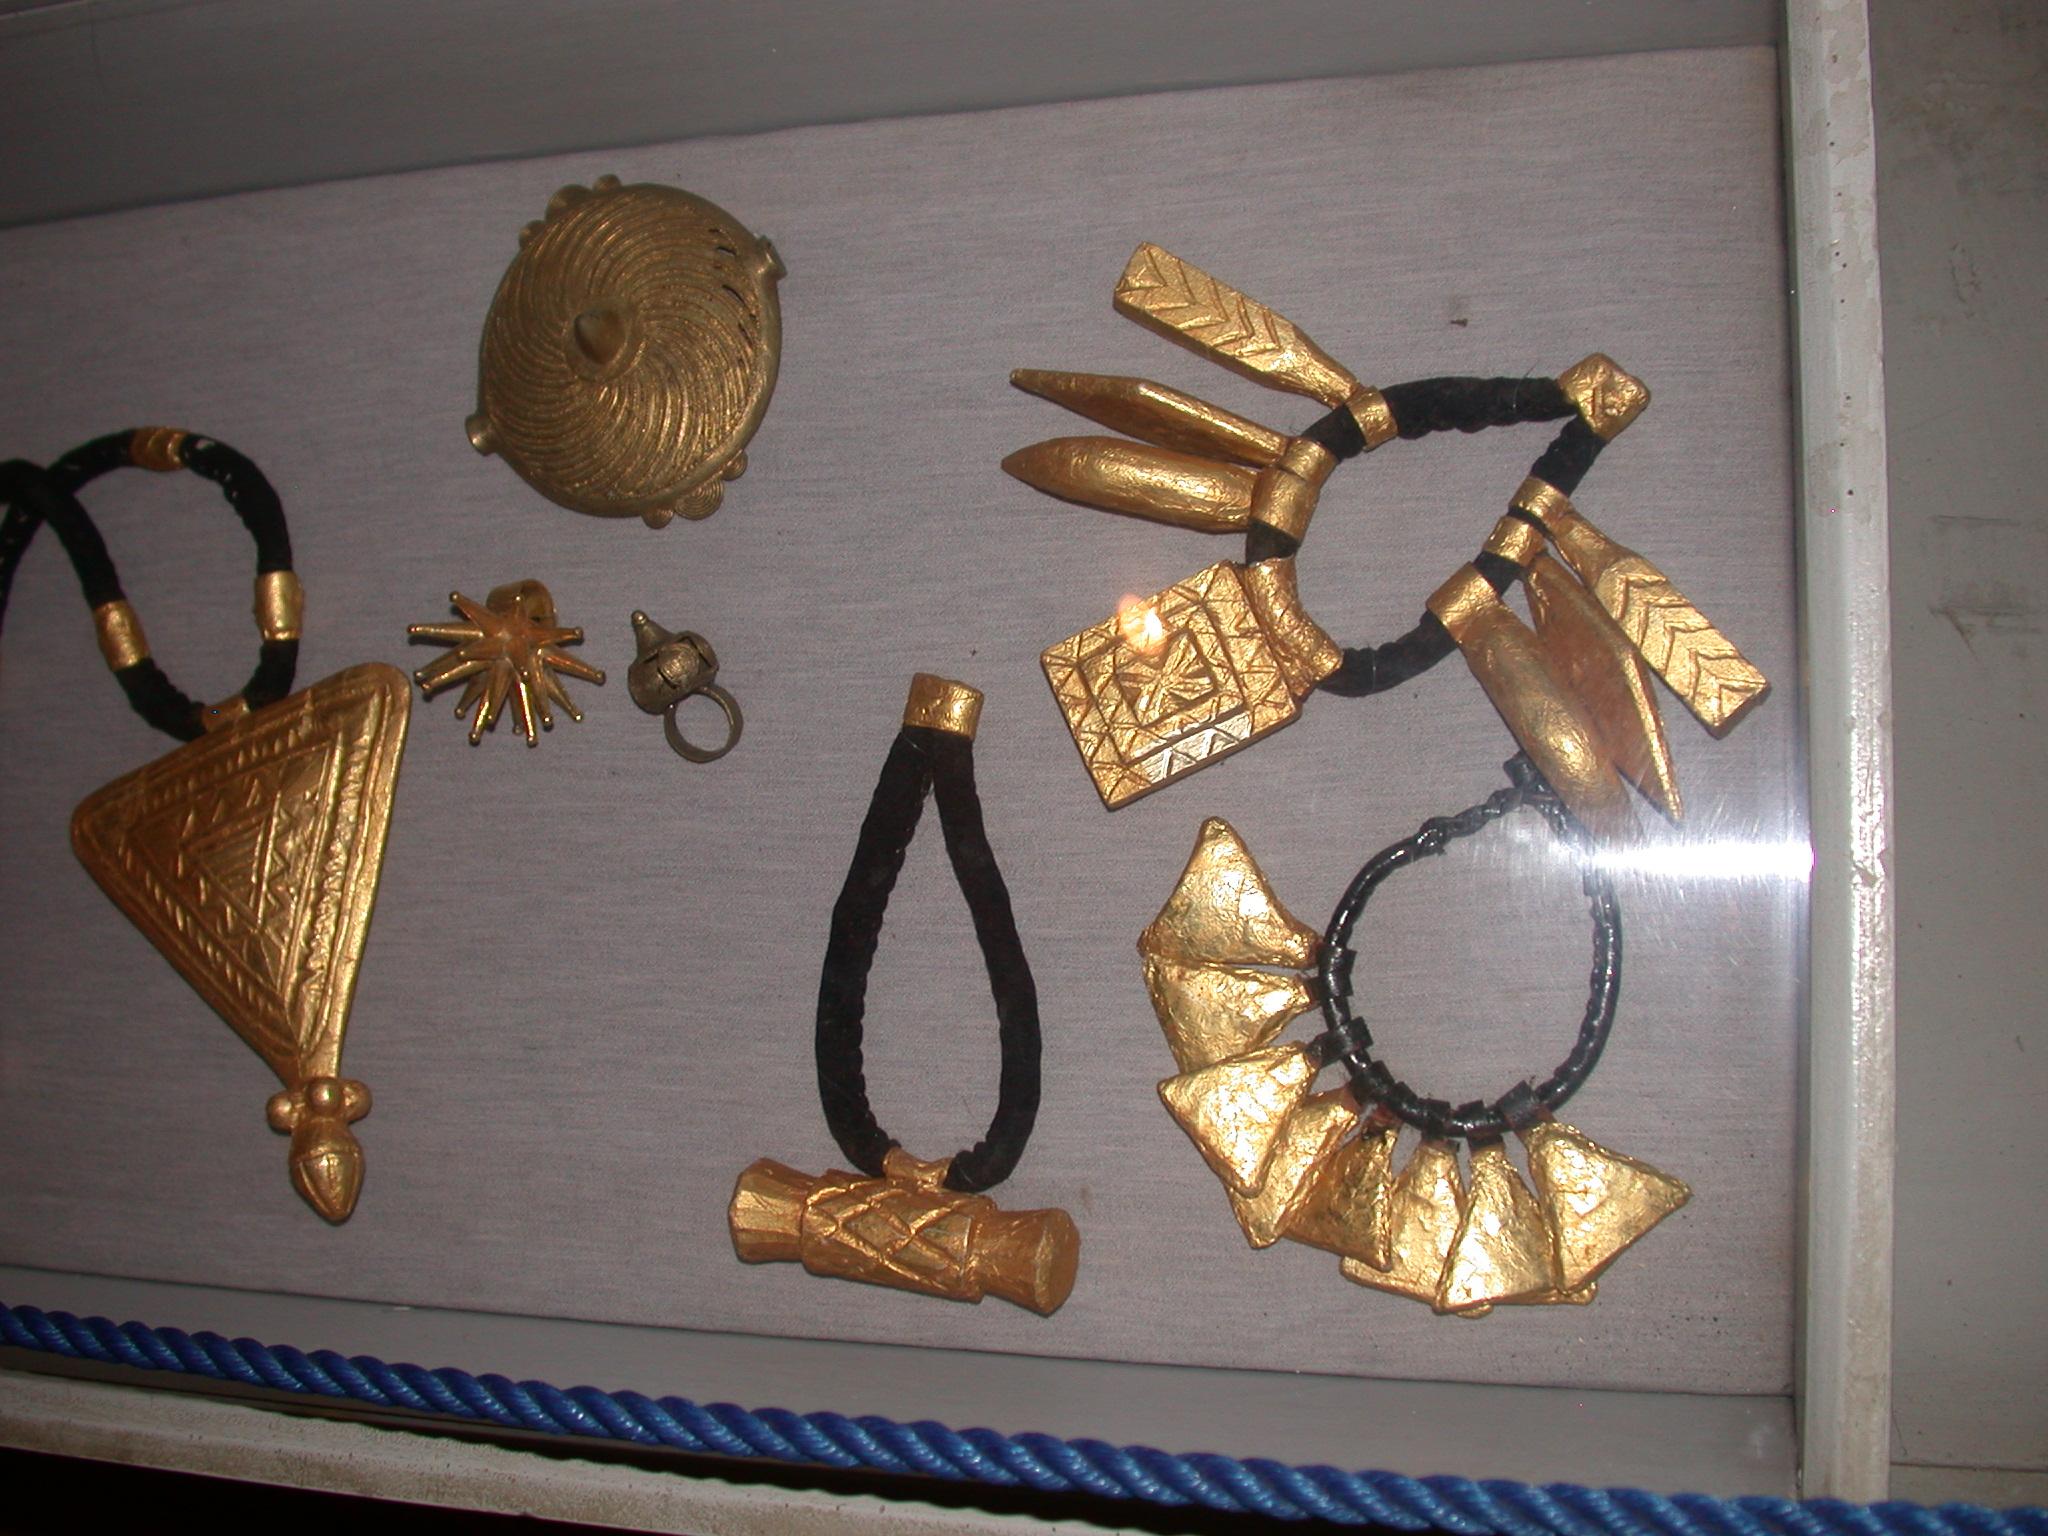 Akan Chief Gold and Gold-Leaf Regalia, Cape Coast Slave Fort Museum, Cape Coast, Ghana